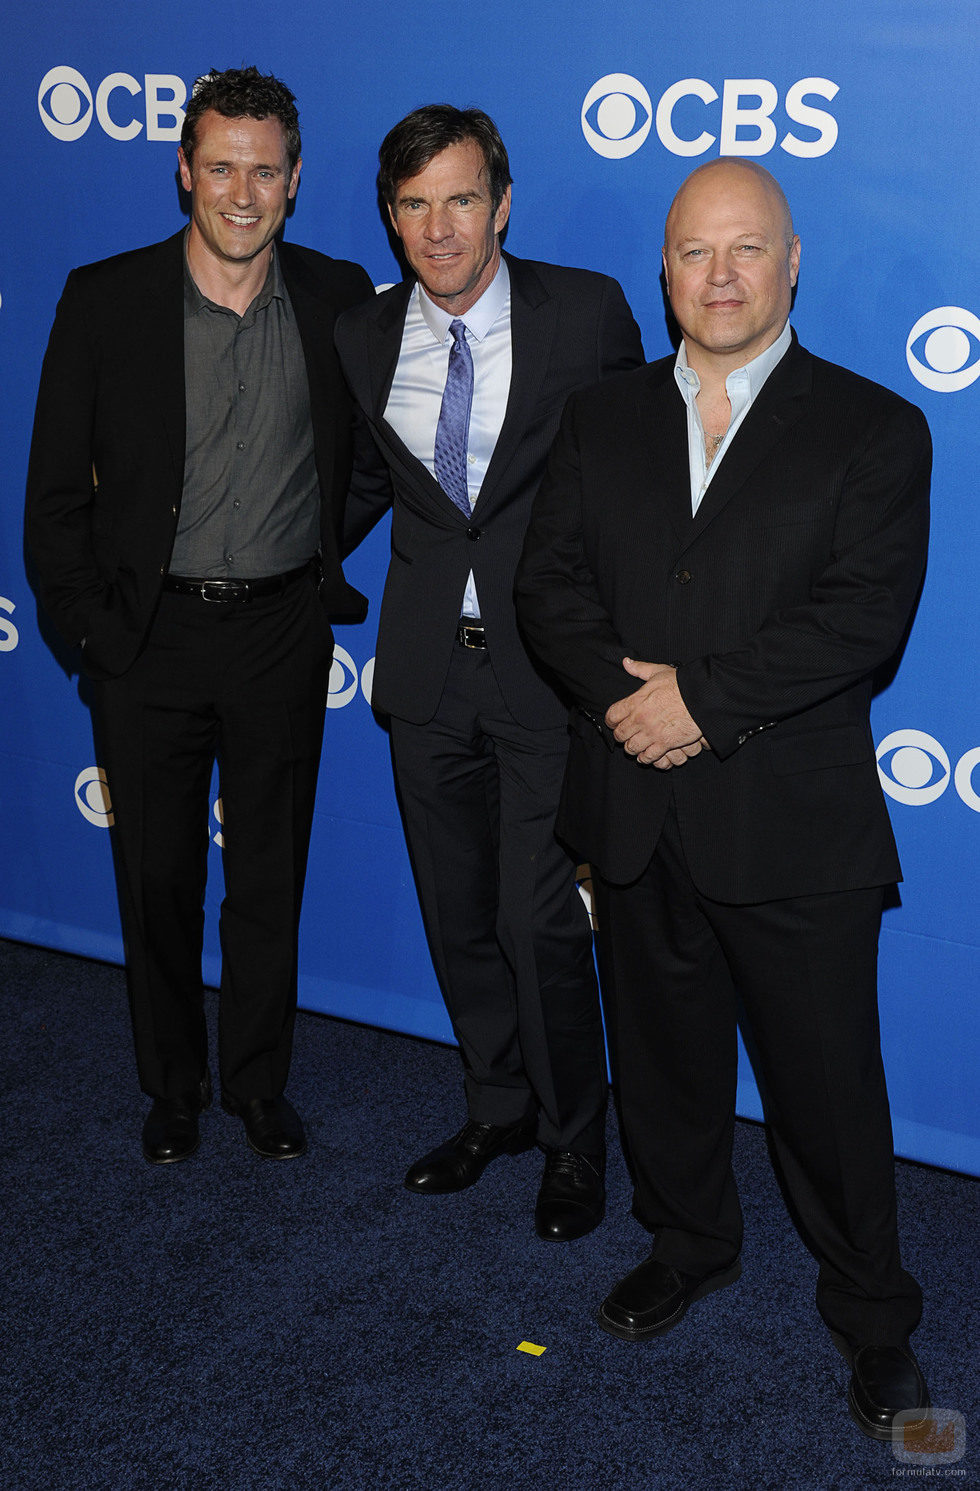 Jason O'Mara, Dennis Quaid y Michael Chiklis en los Upfronts 2012 de CBS